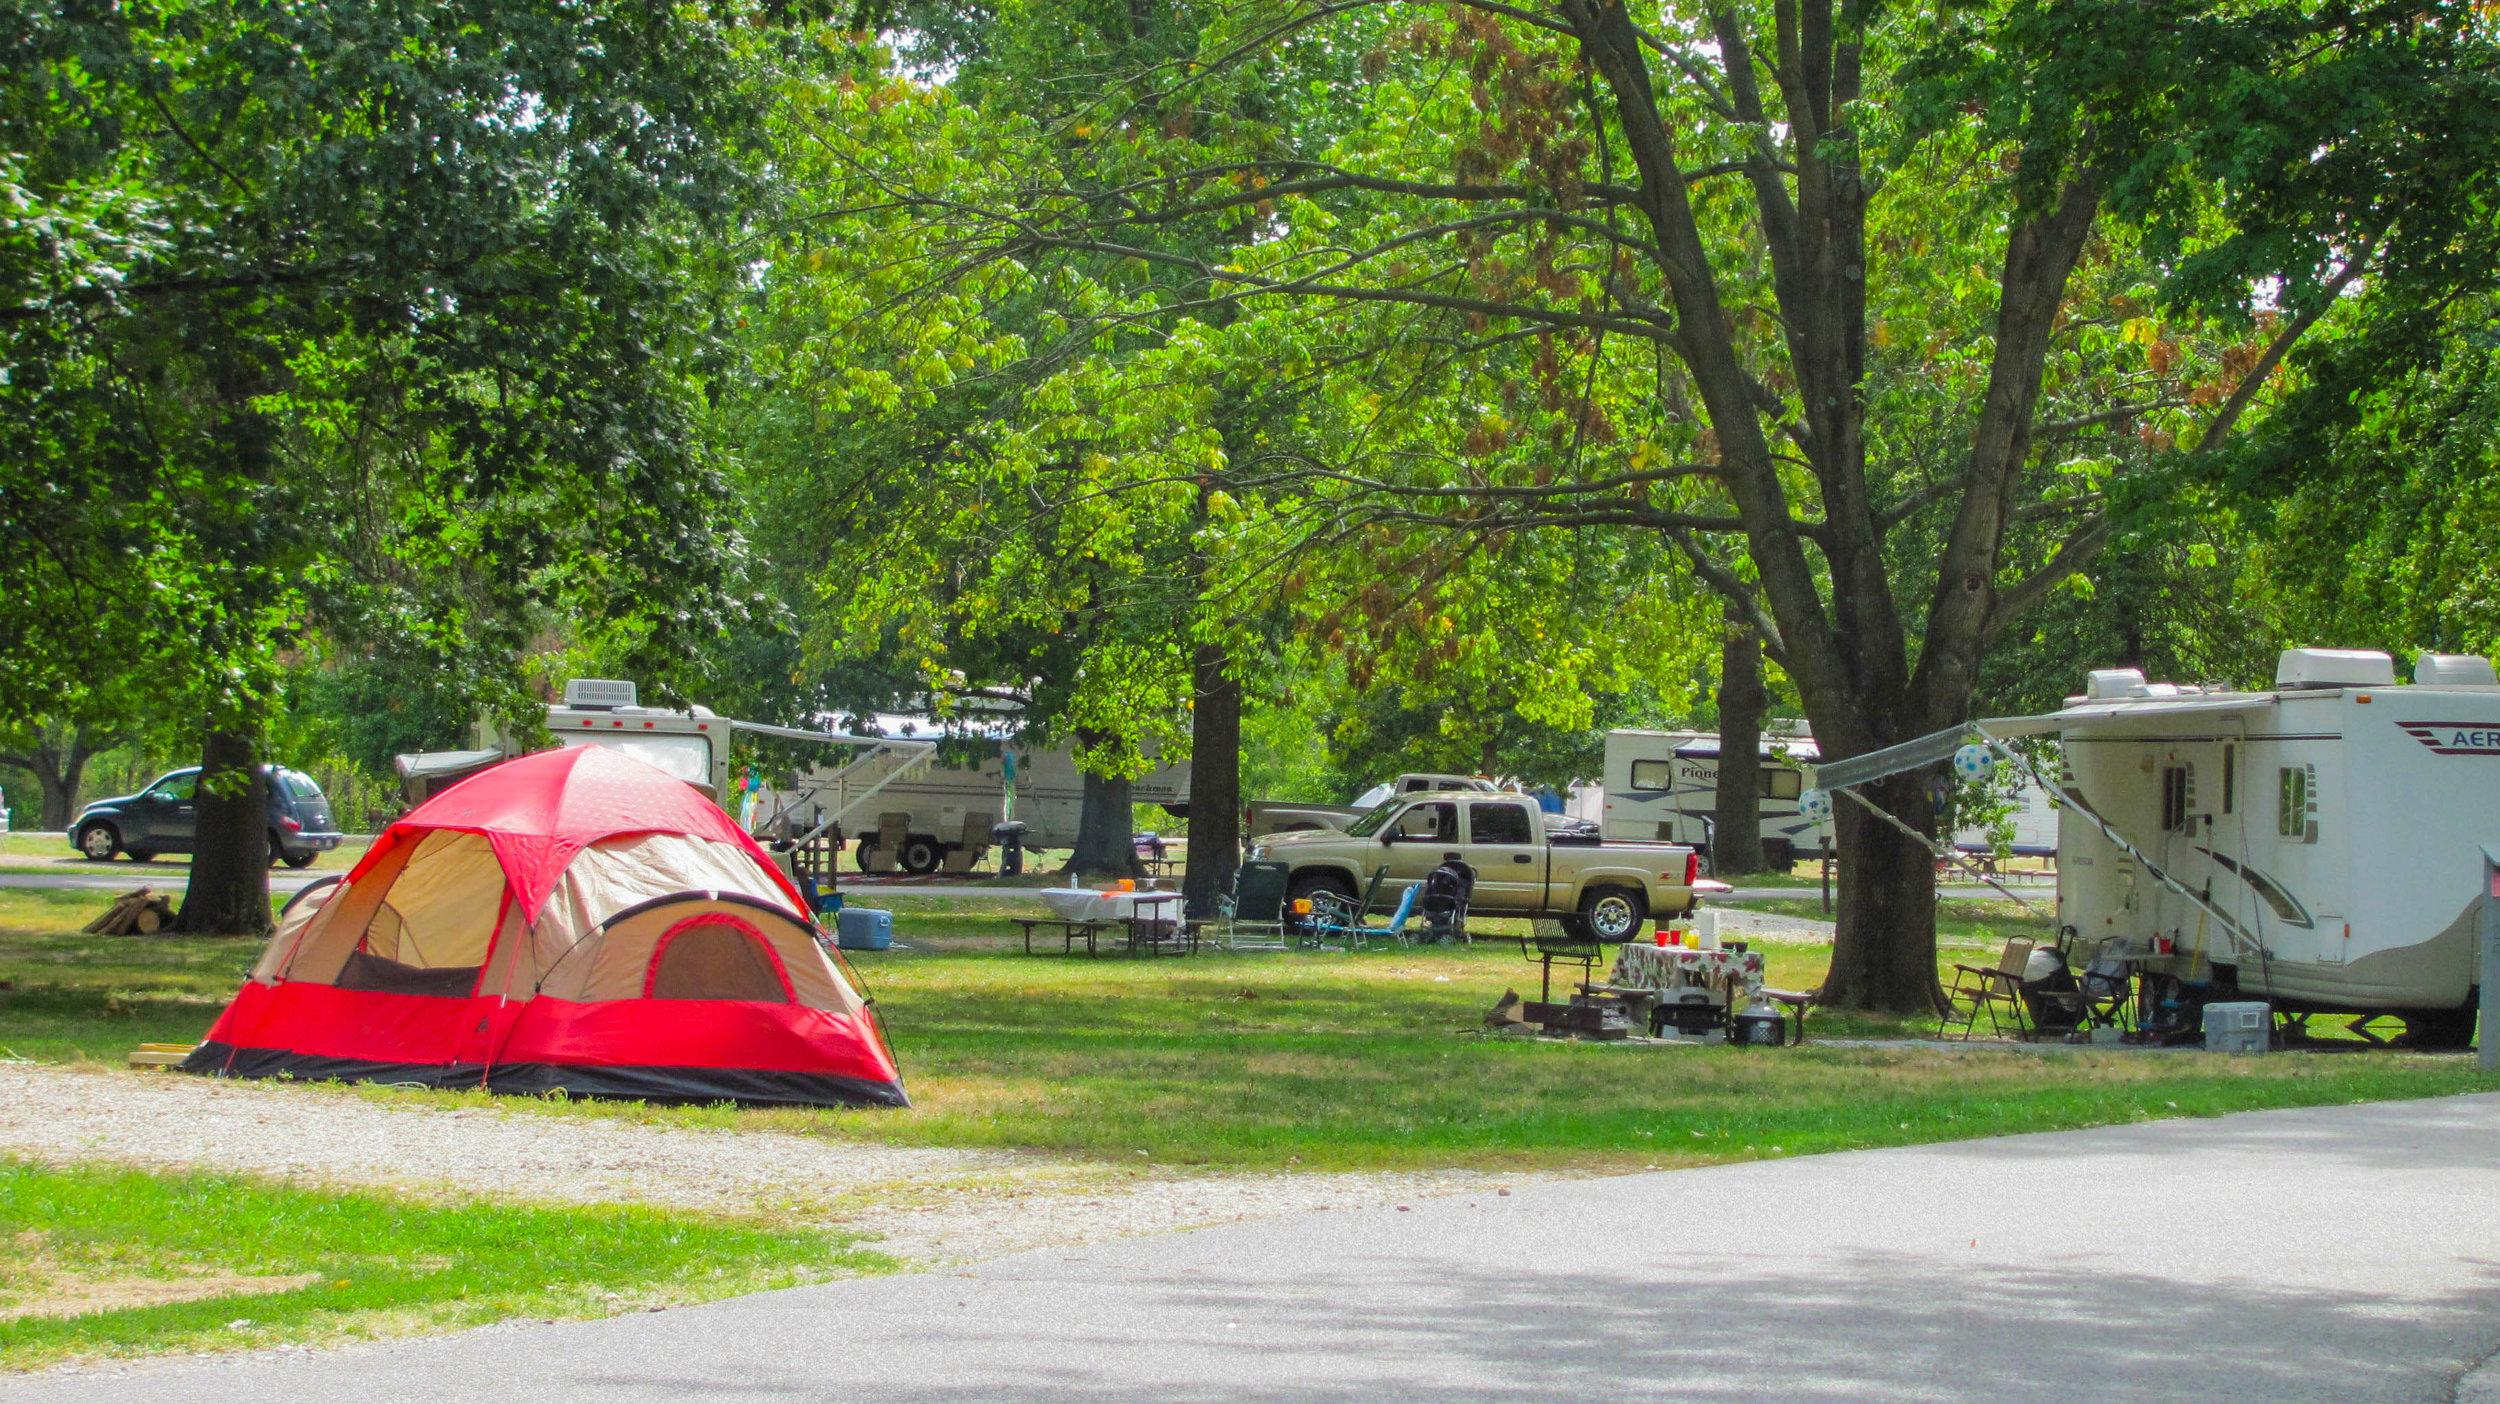 pere-camp-08182012-alr-1306.jpg